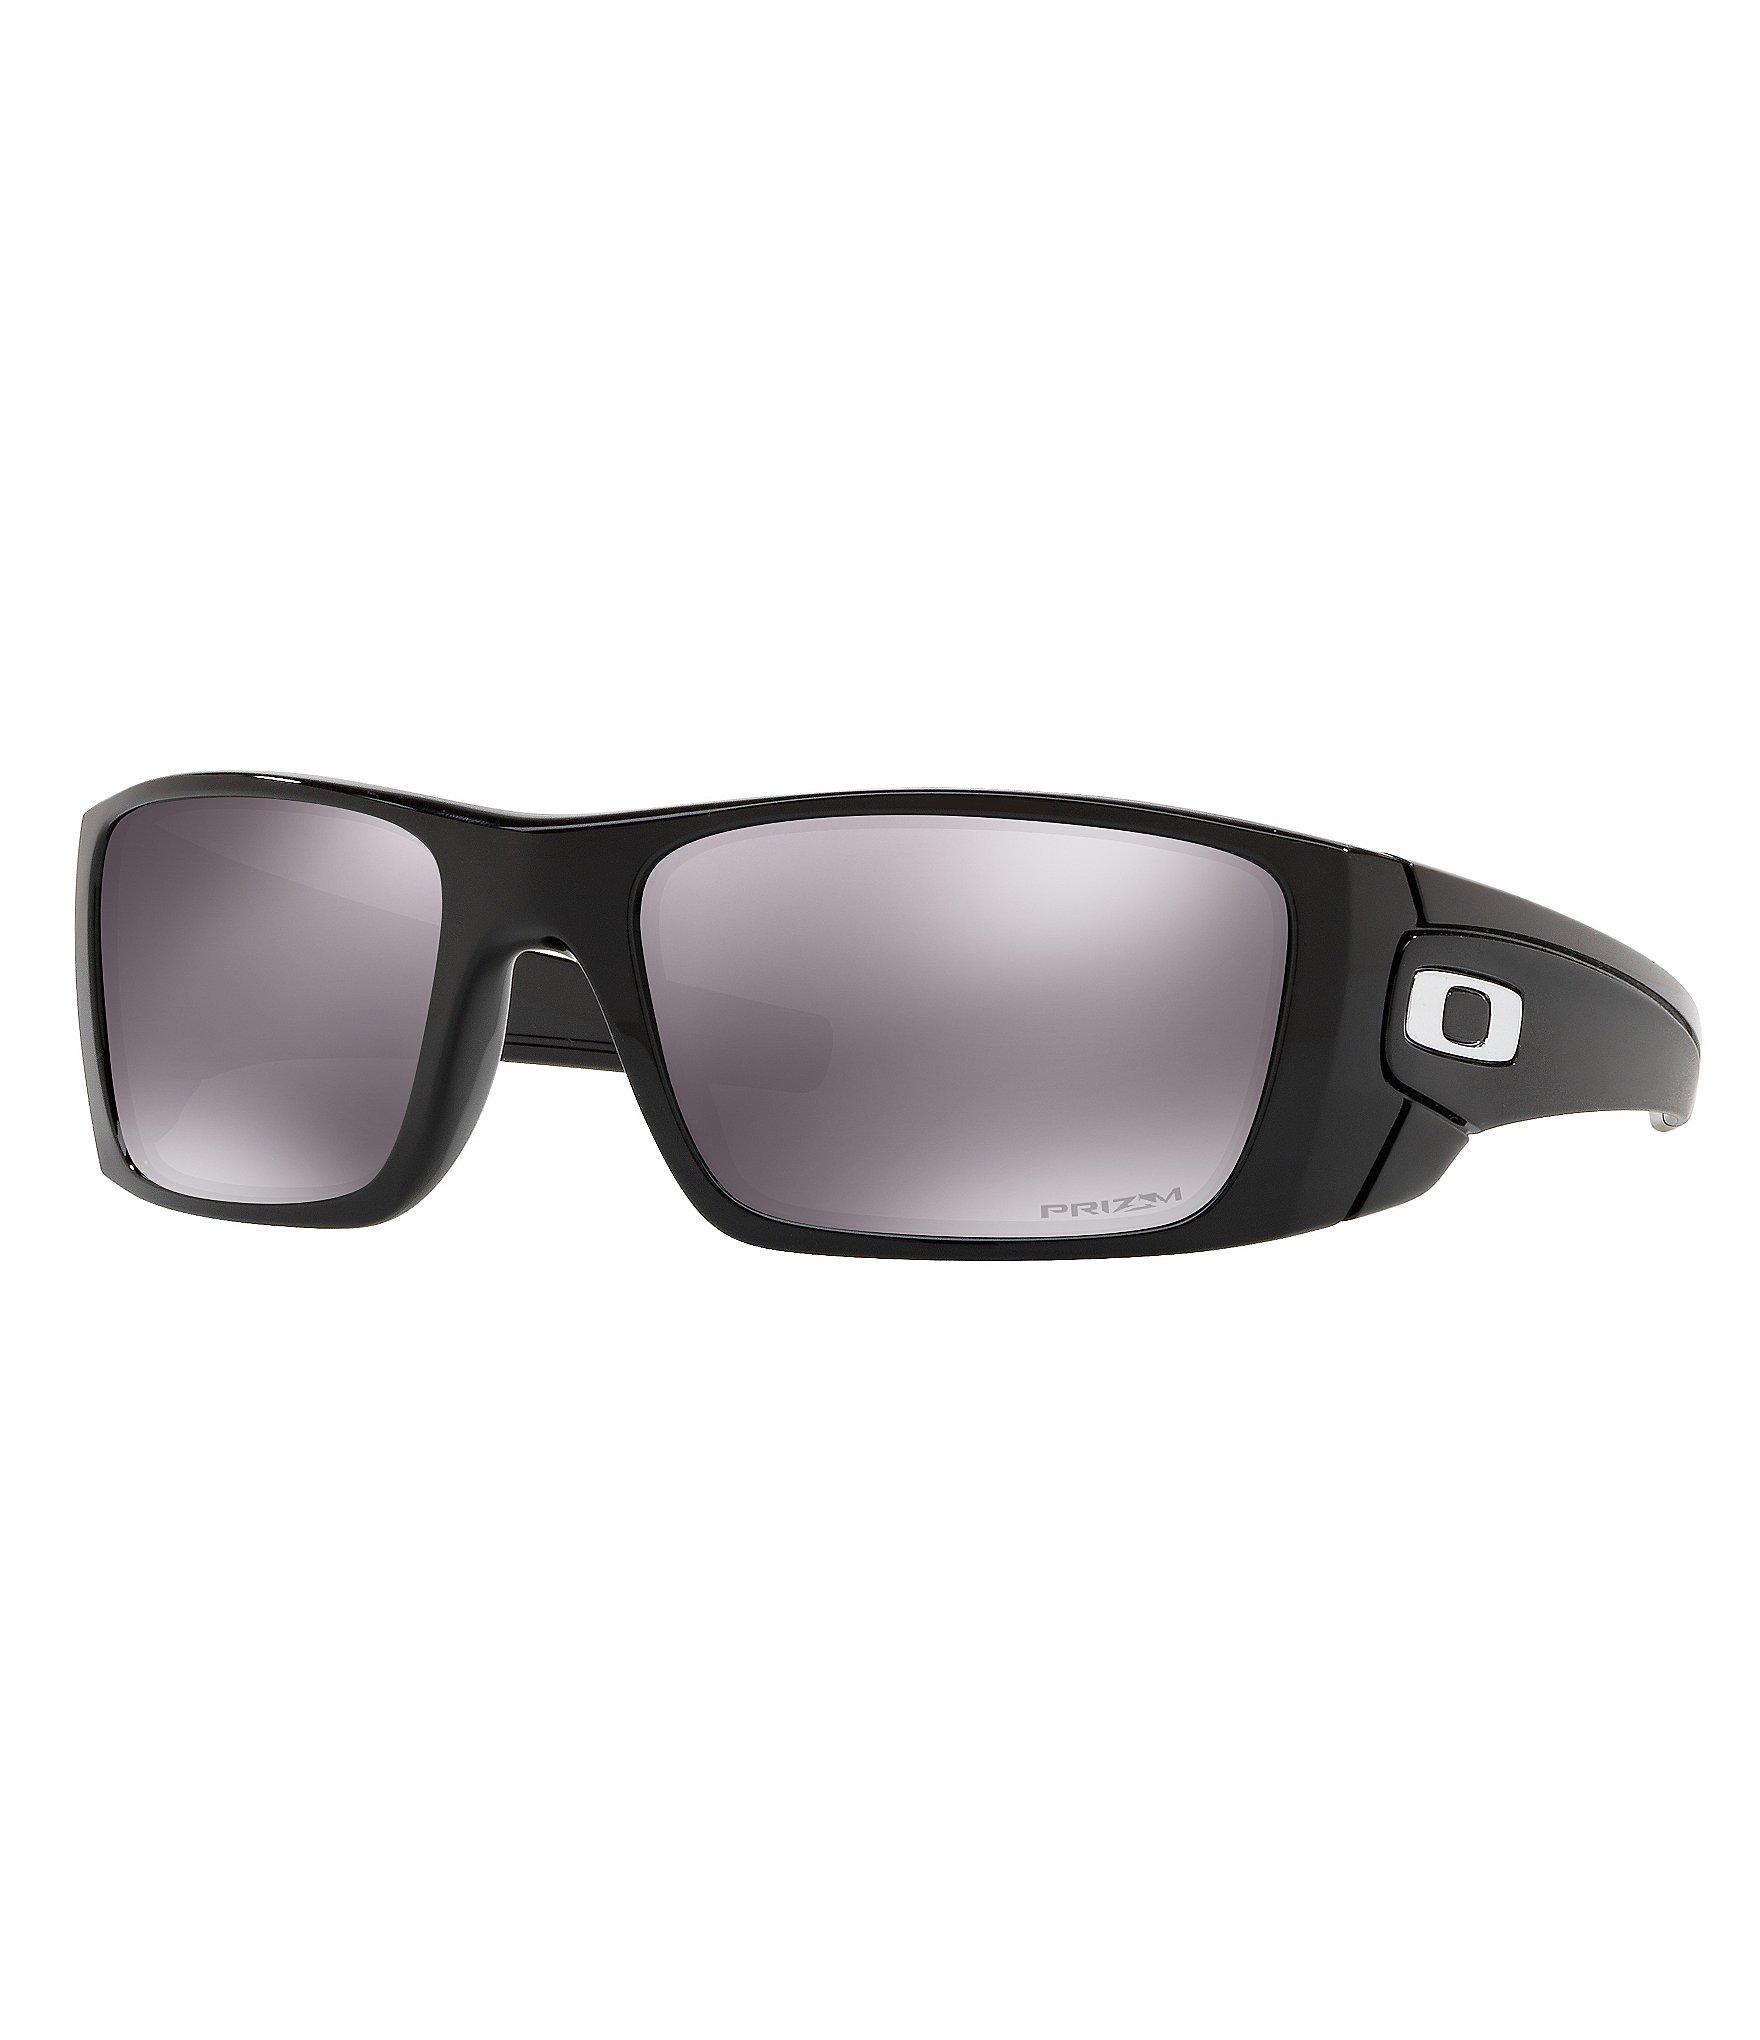 Sunglasses & Eyewear   Dillards